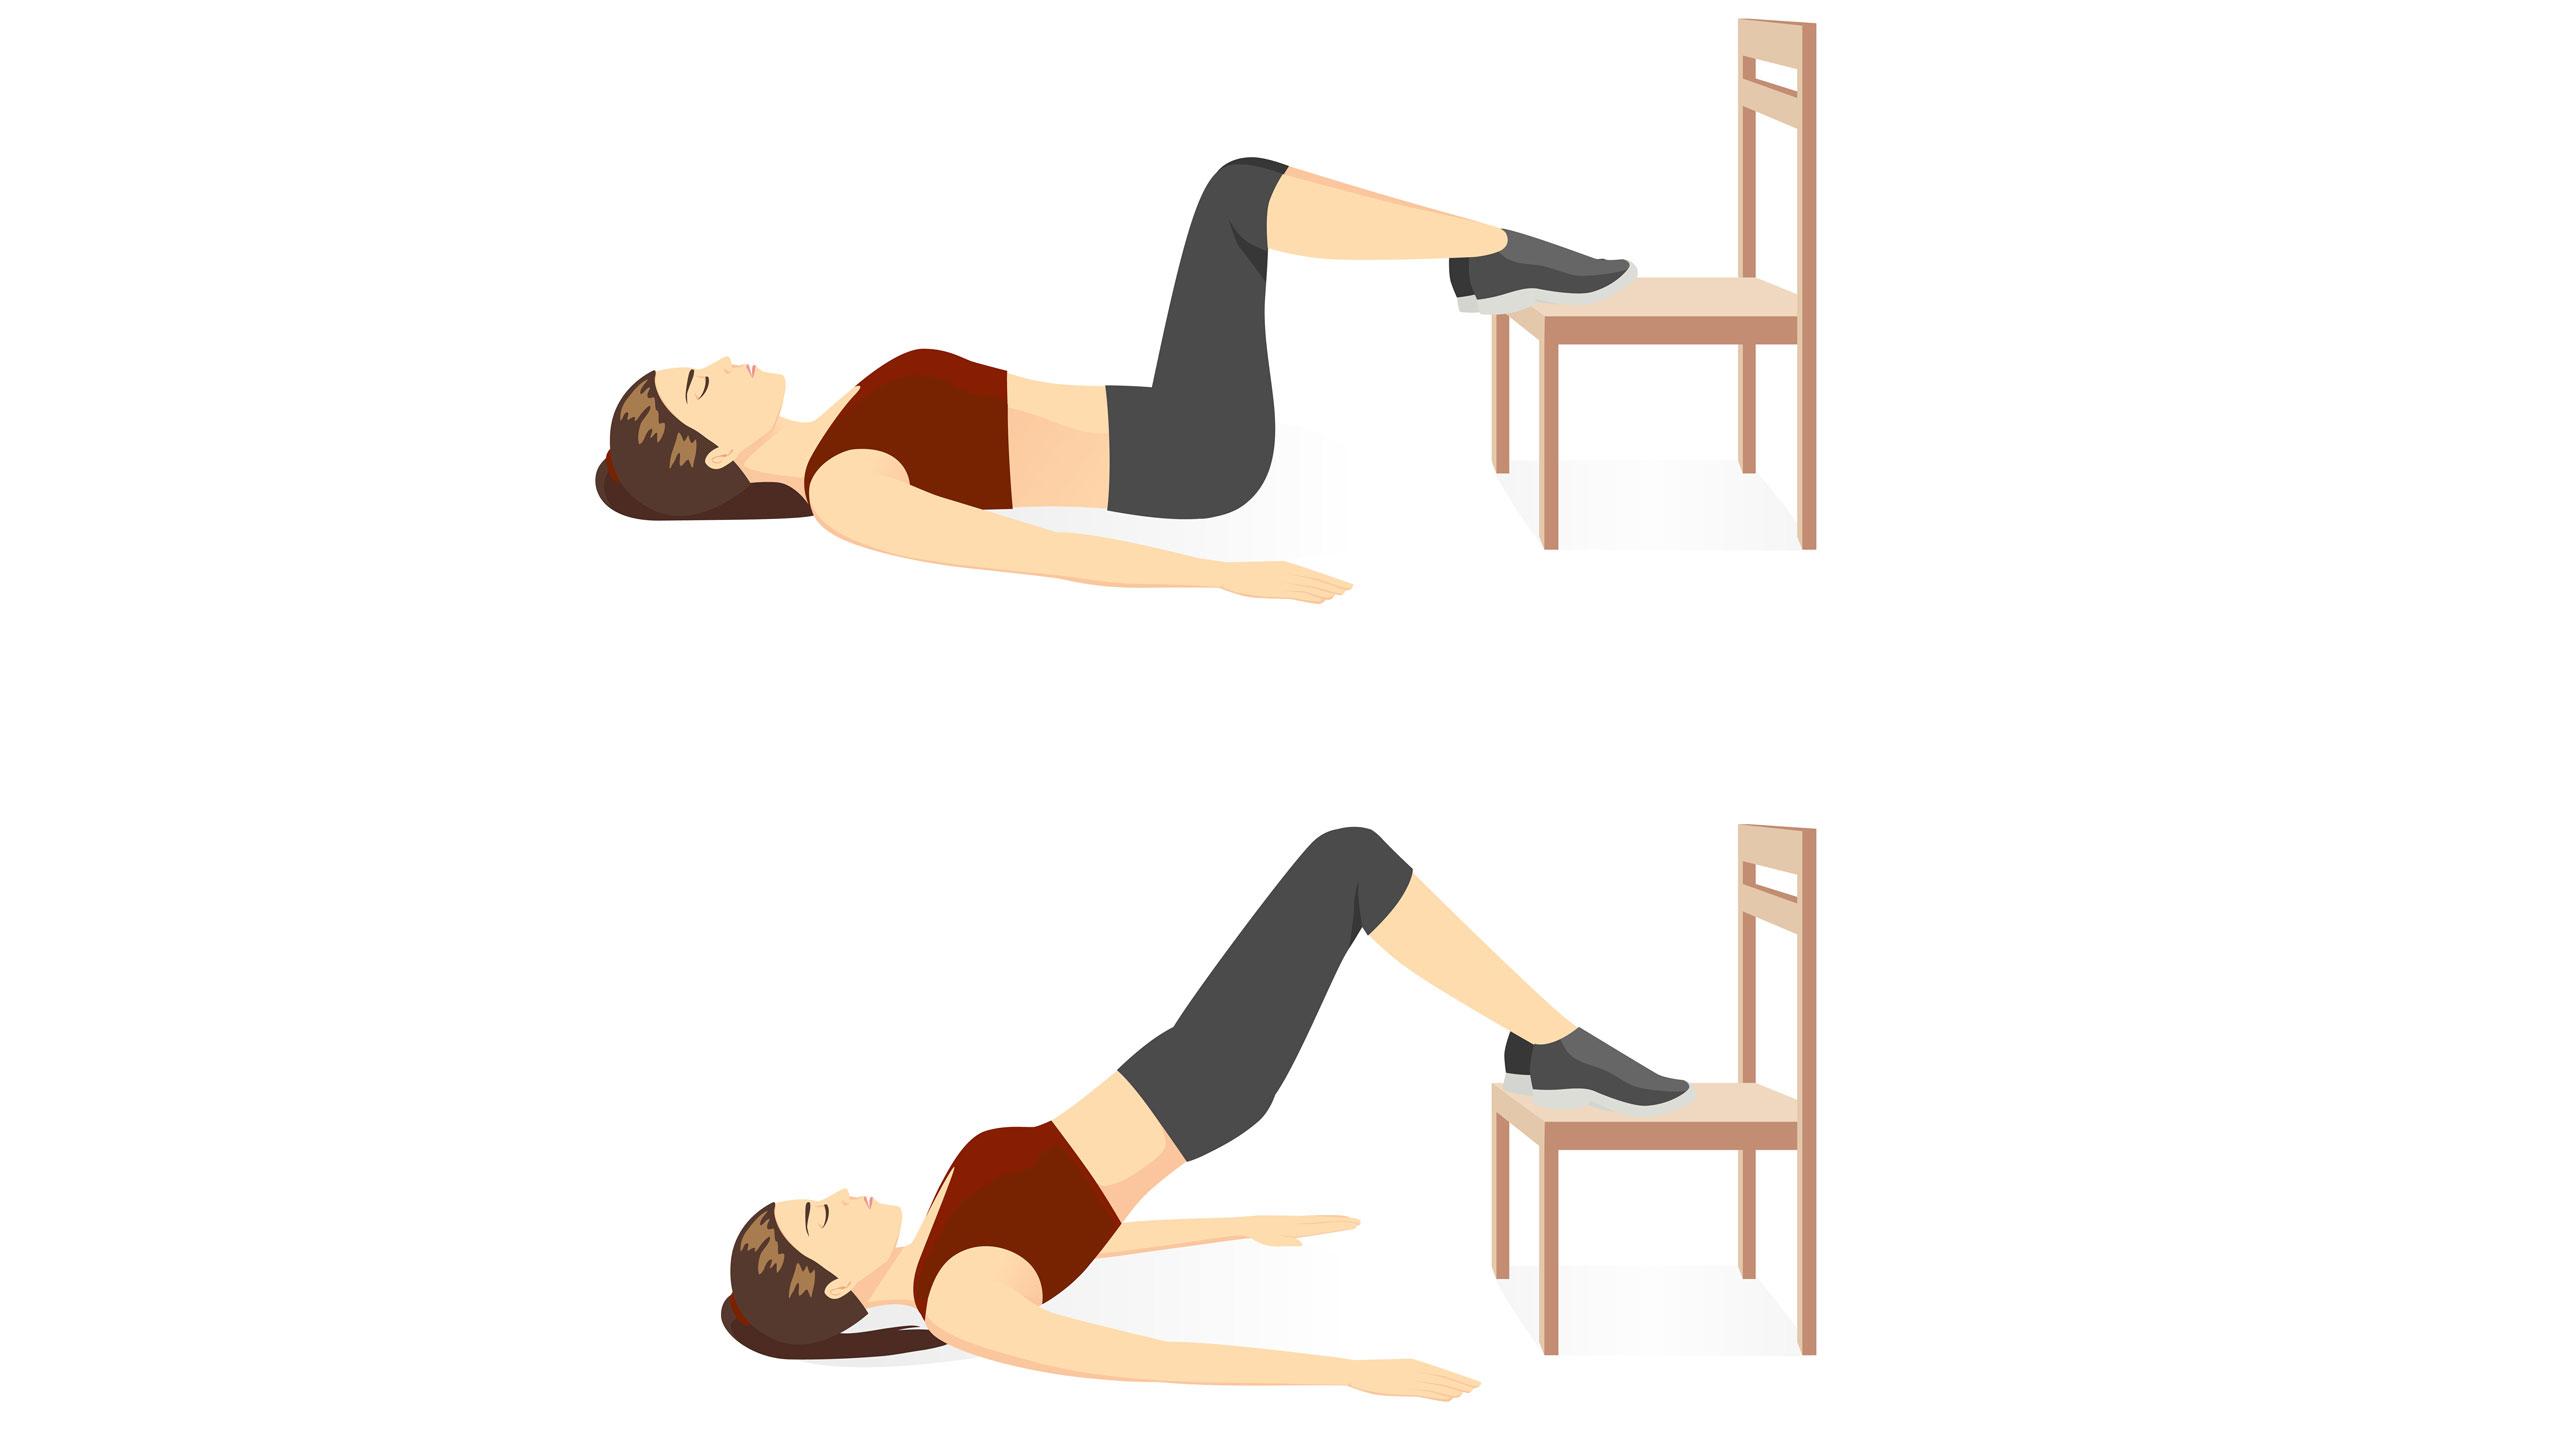 Interliving_Workout_Moebel_Beckenlift